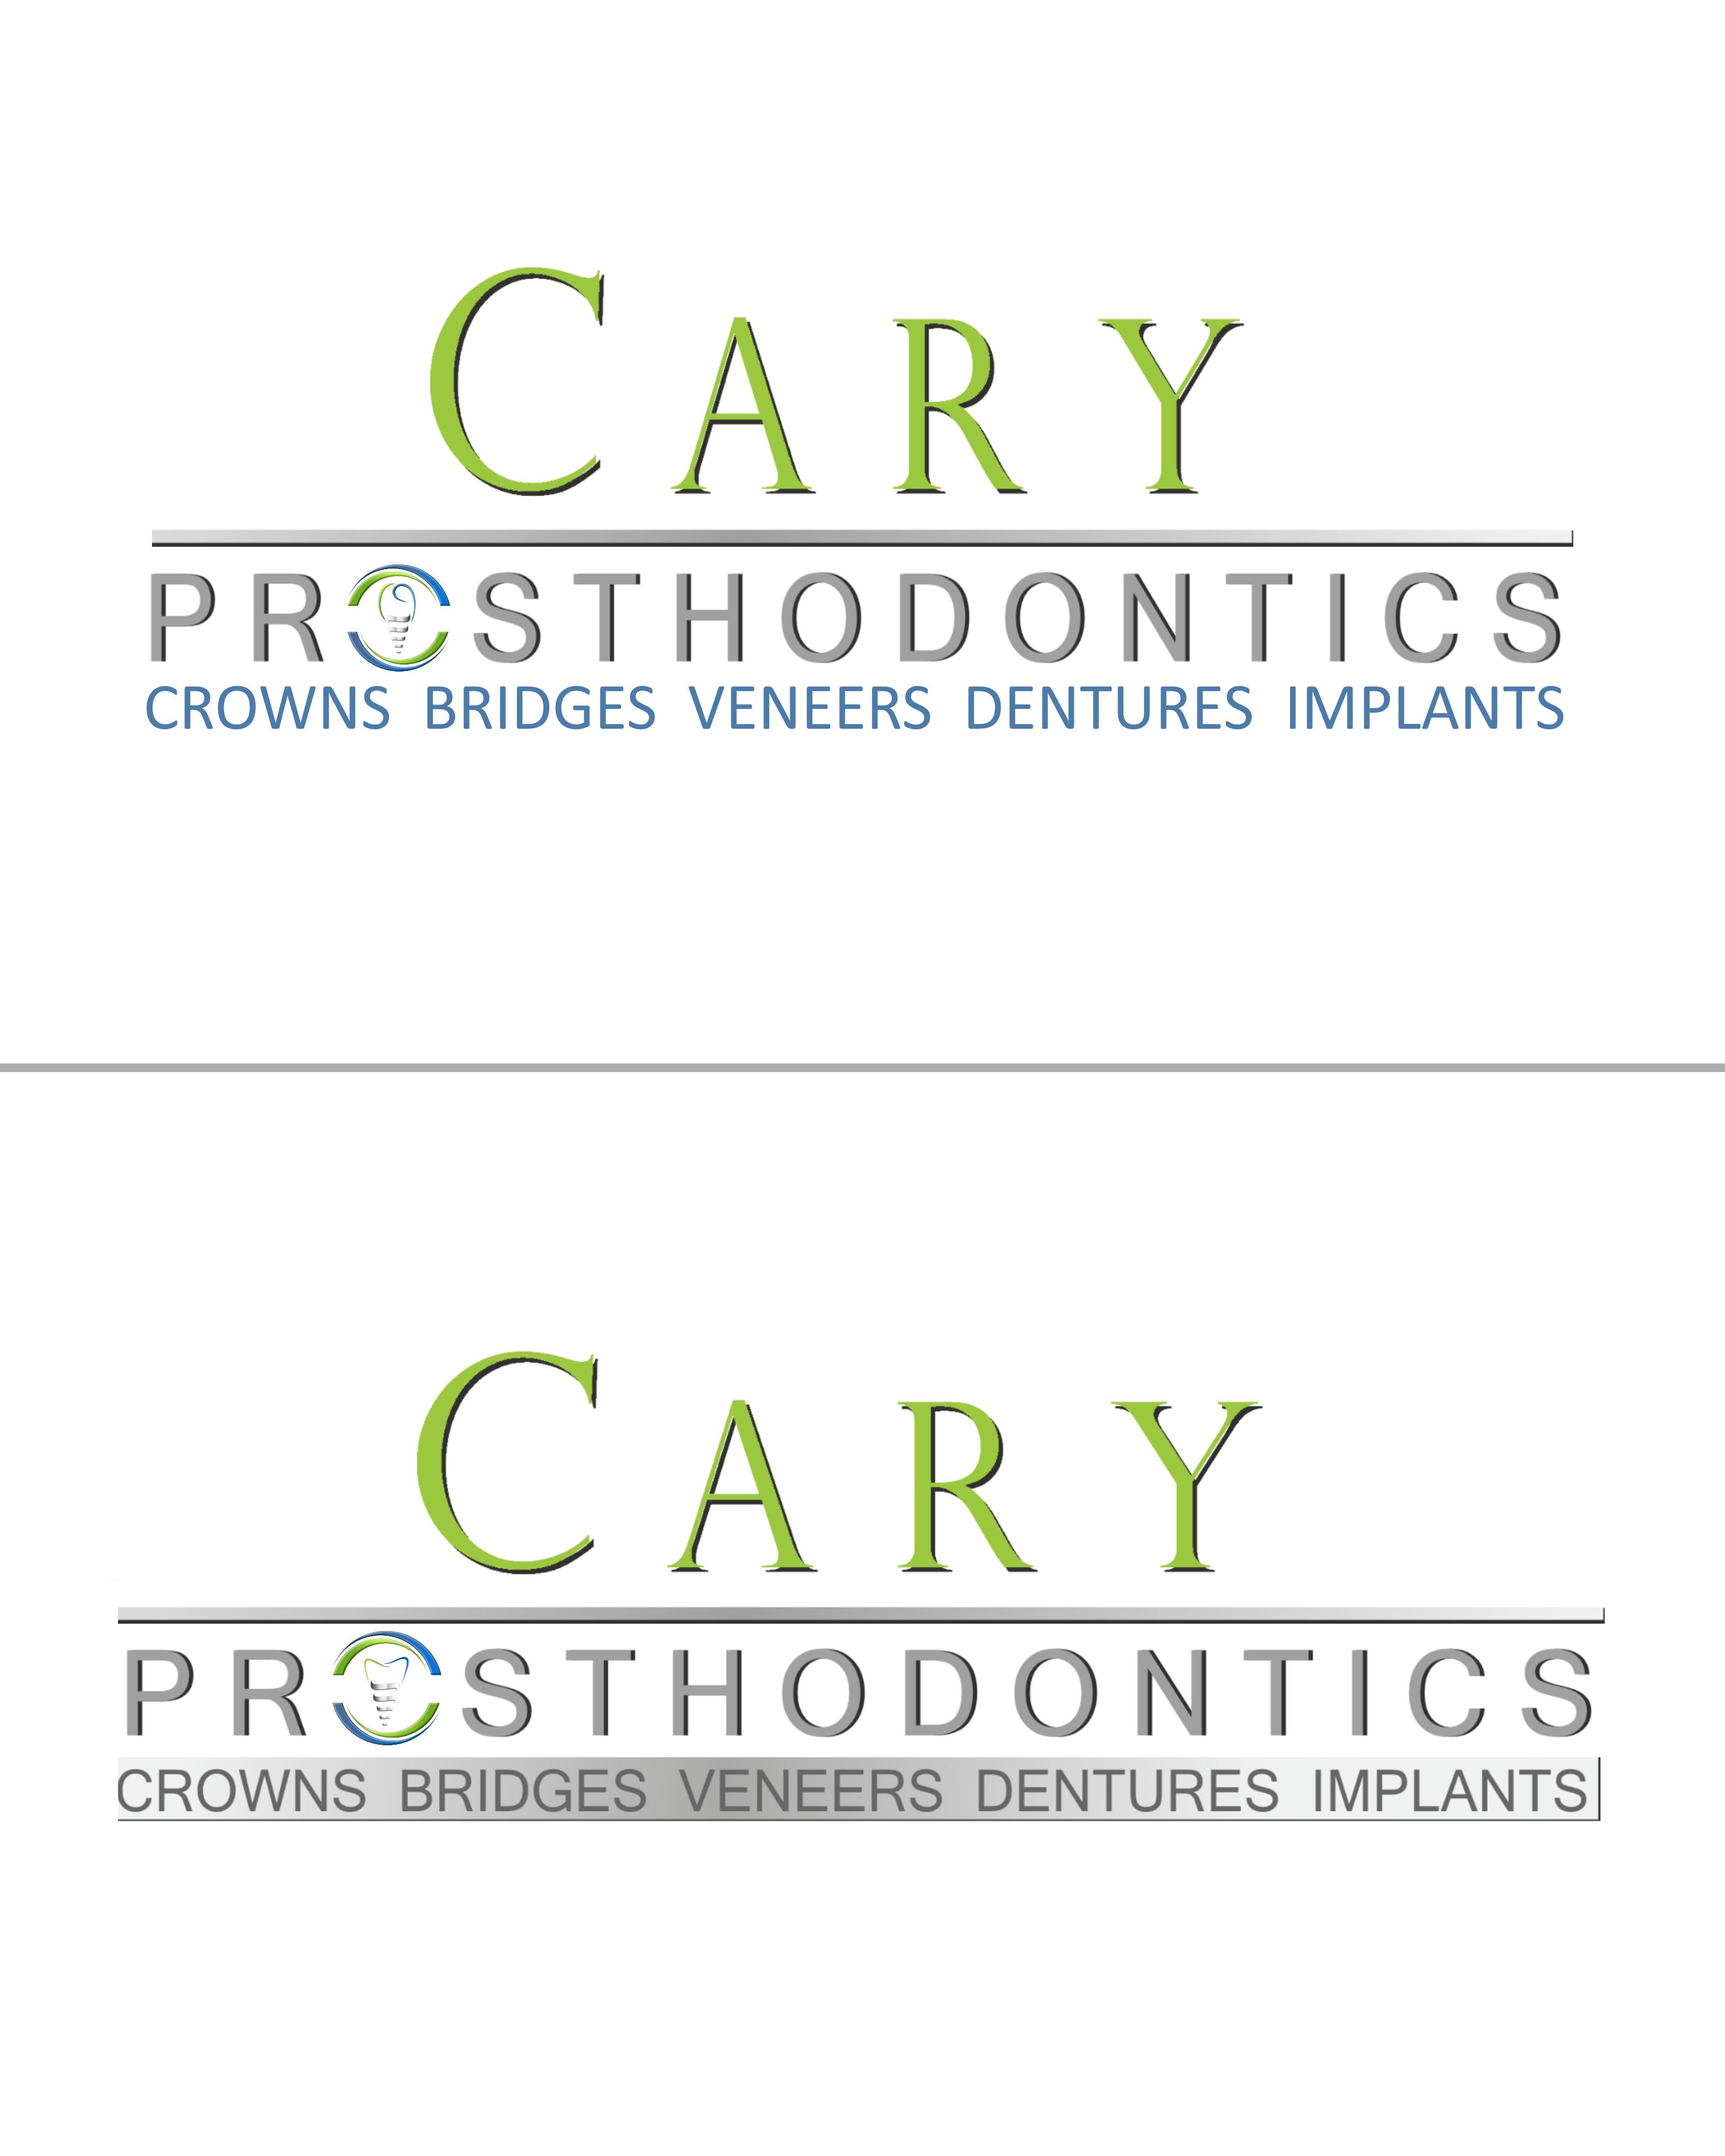 Logo Design by Roberto Bassi - Entry No. 196 in the Logo Design Contest Cary Prosthodontics Logo Design.